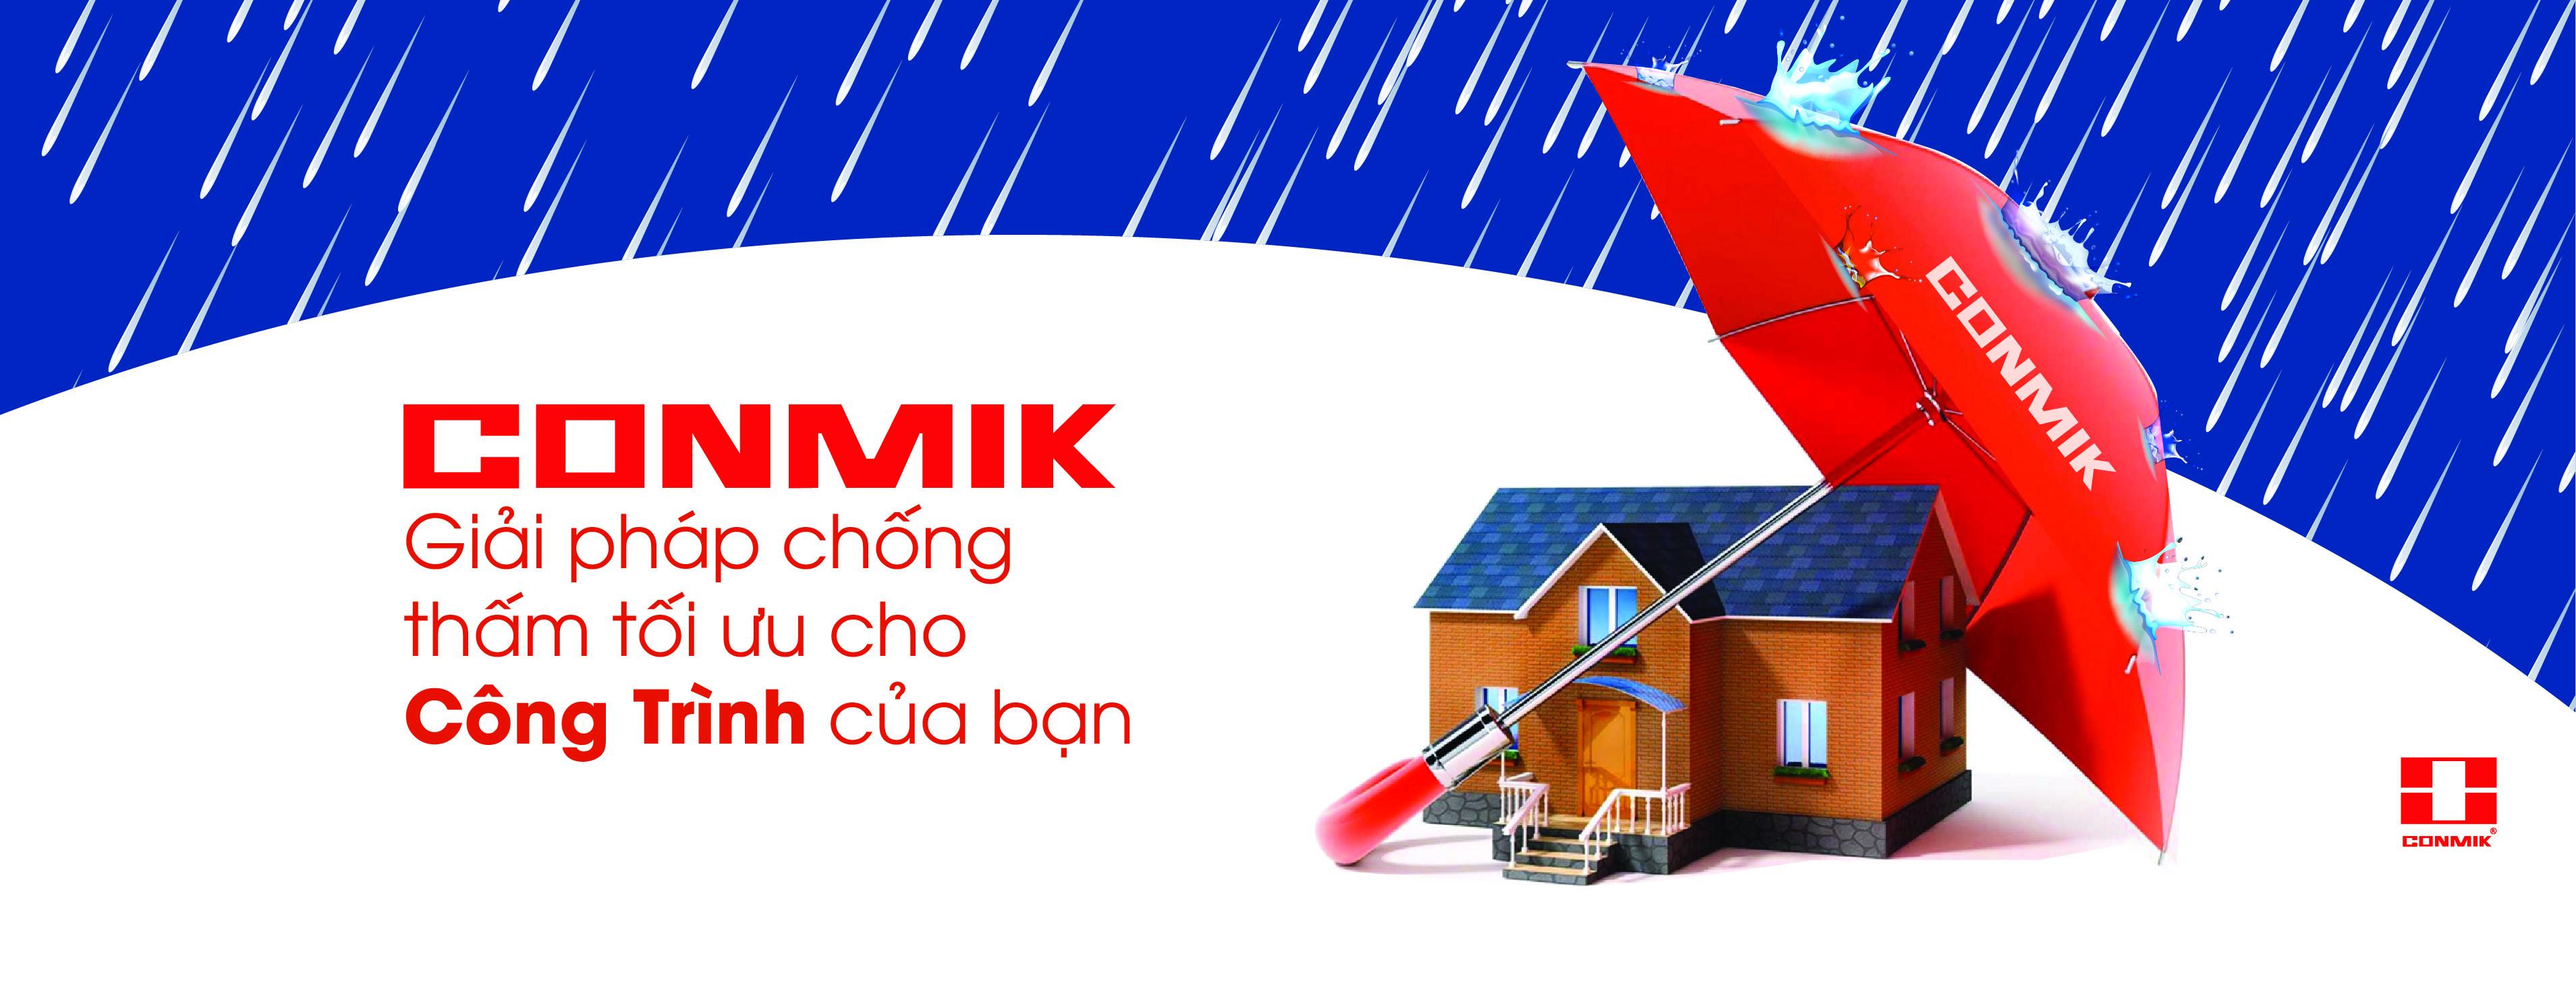 chong-tham-nghe-an-0385043446